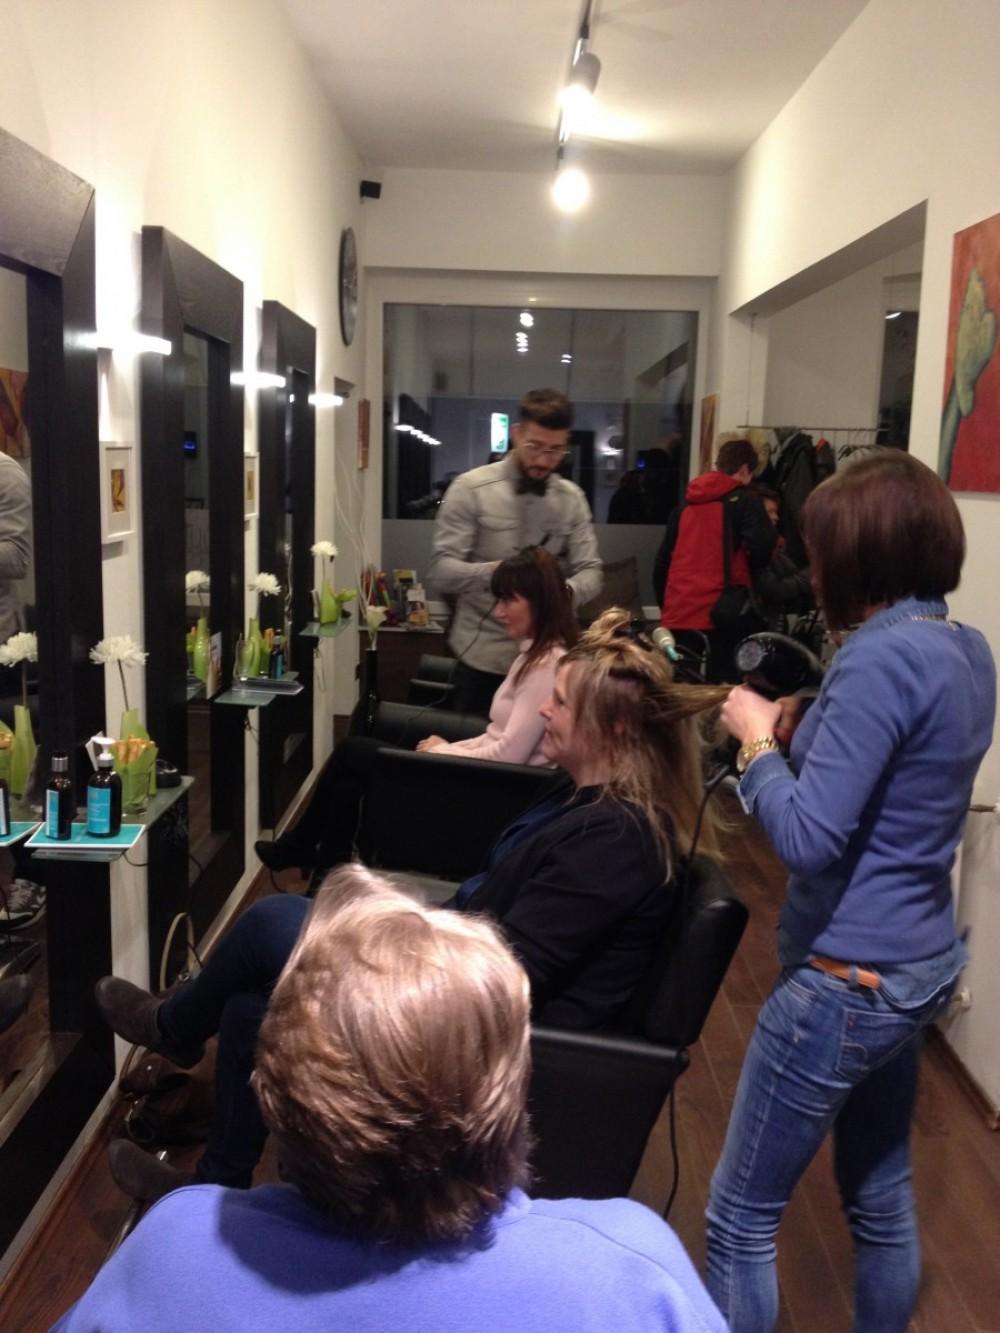 moroccanoil salon event studio 25 ihr friseur in barsinghausen. Black Bedroom Furniture Sets. Home Design Ideas